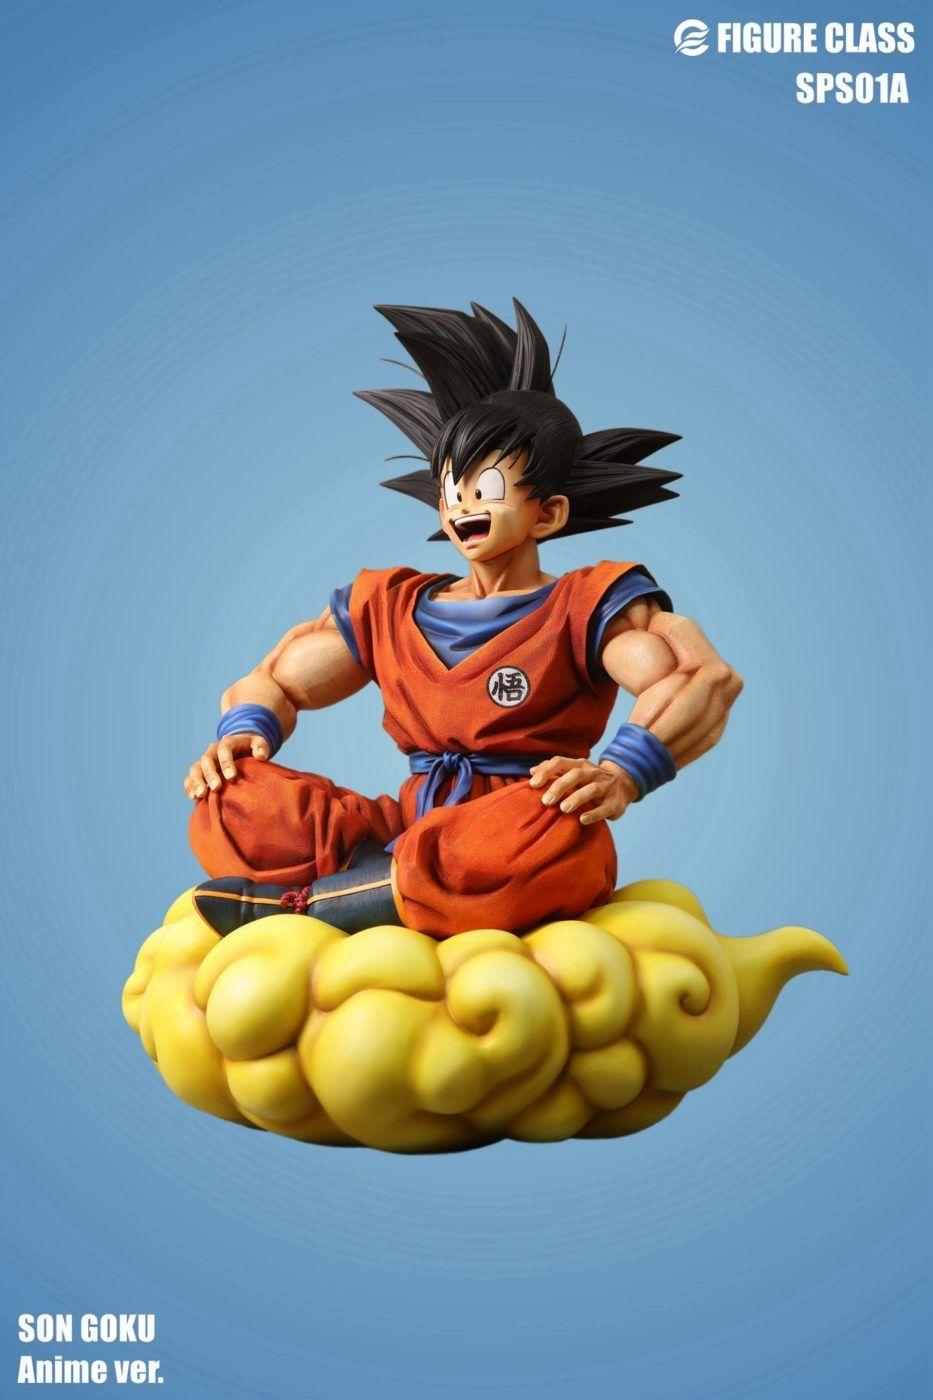 Kid Goku By Maffo1989 On Deviantart Anime Dragon Ball Super Kid Goku Anime Dragon Ball